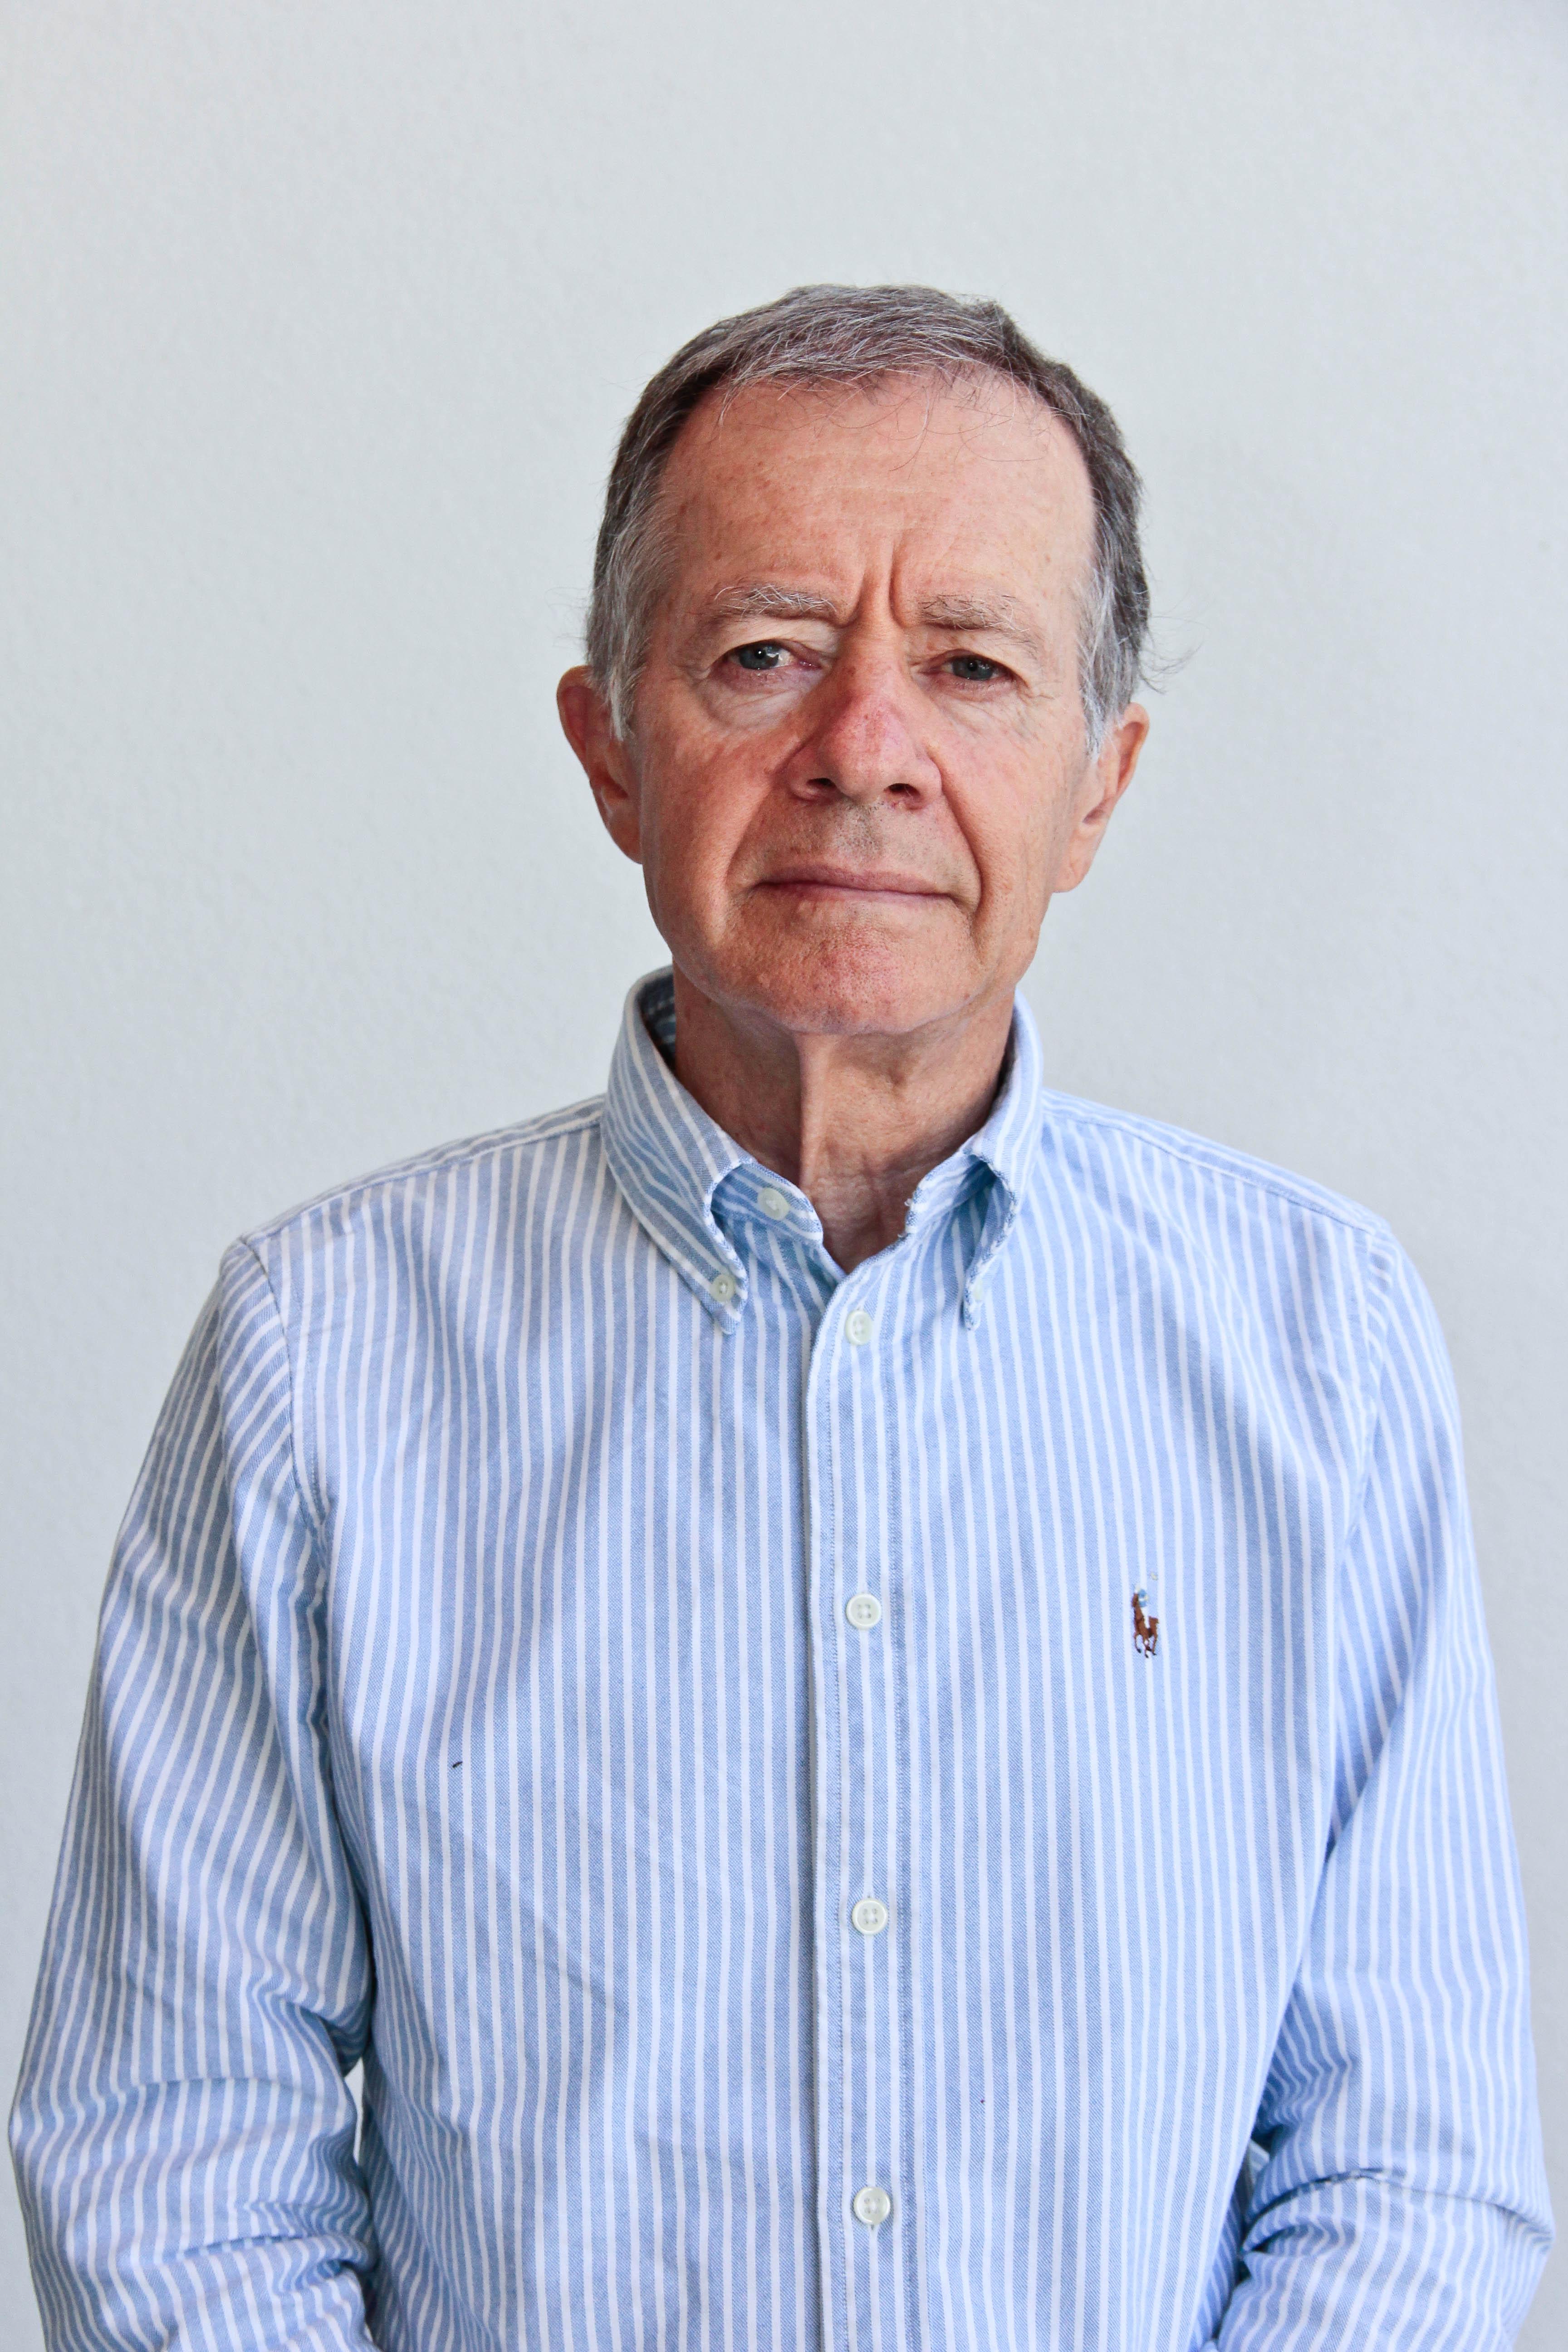 Hernán Rodríguez Villegas